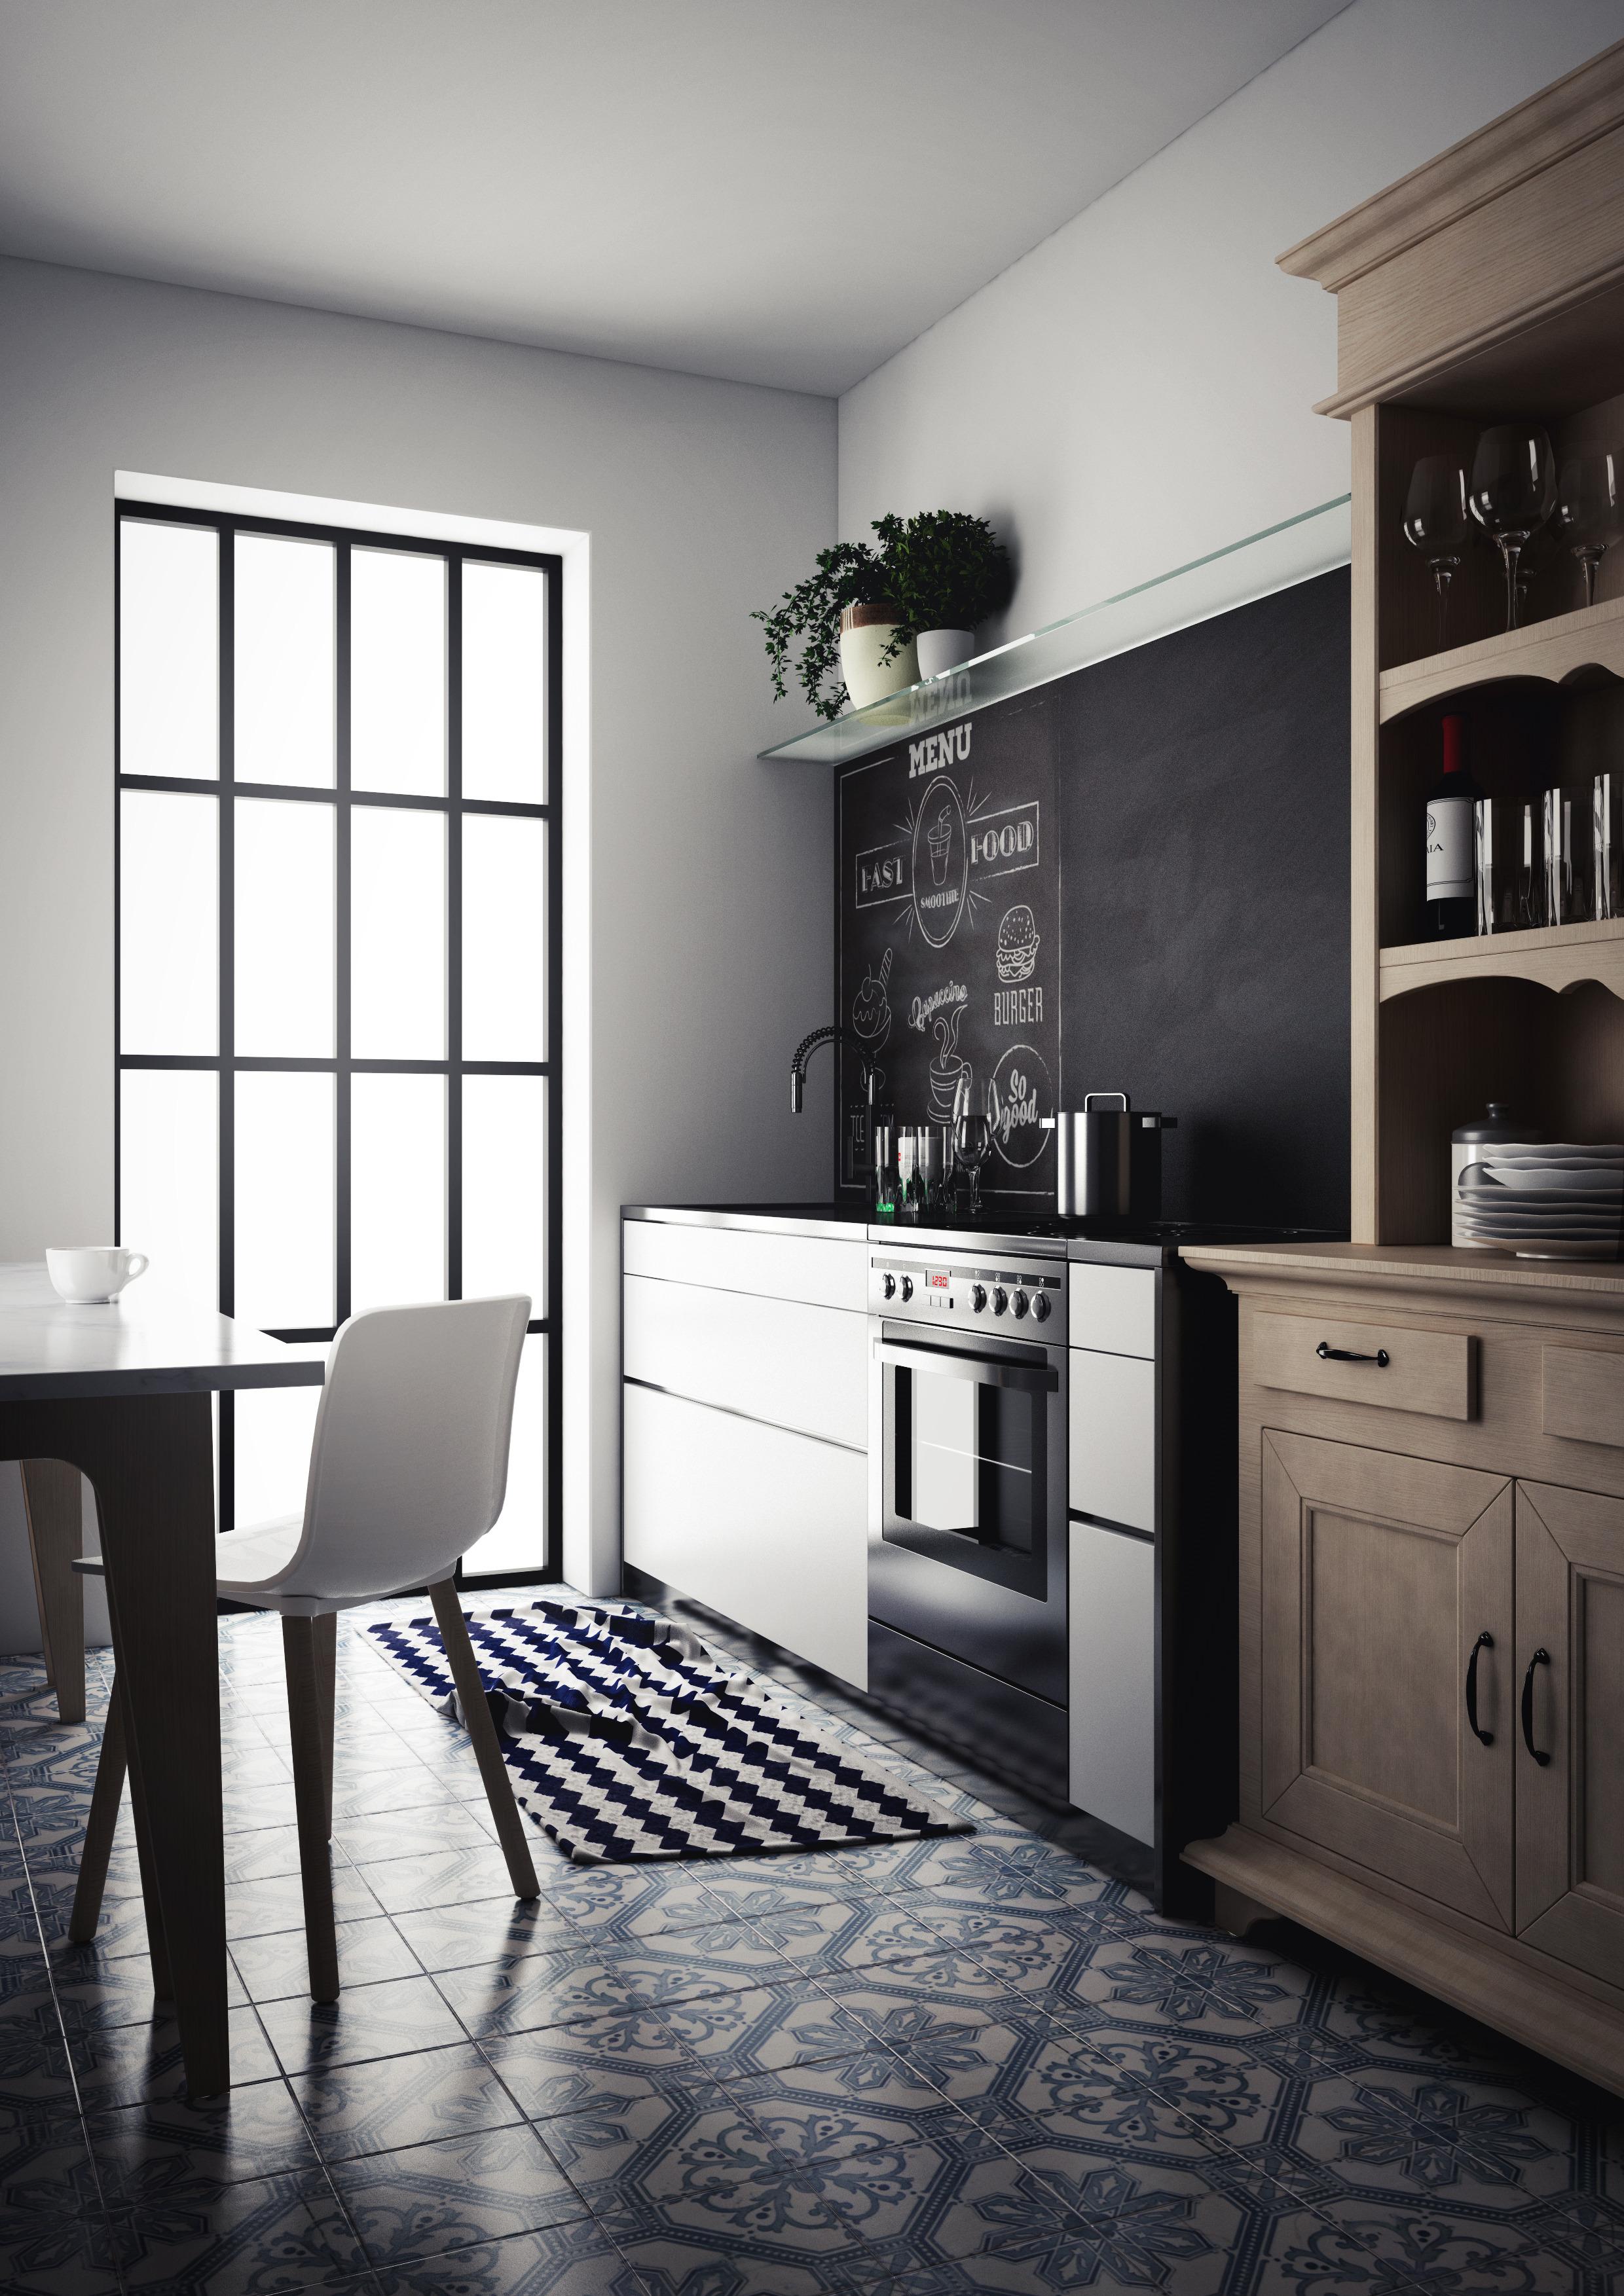 Vintage kitchen scene setup c4d + vray